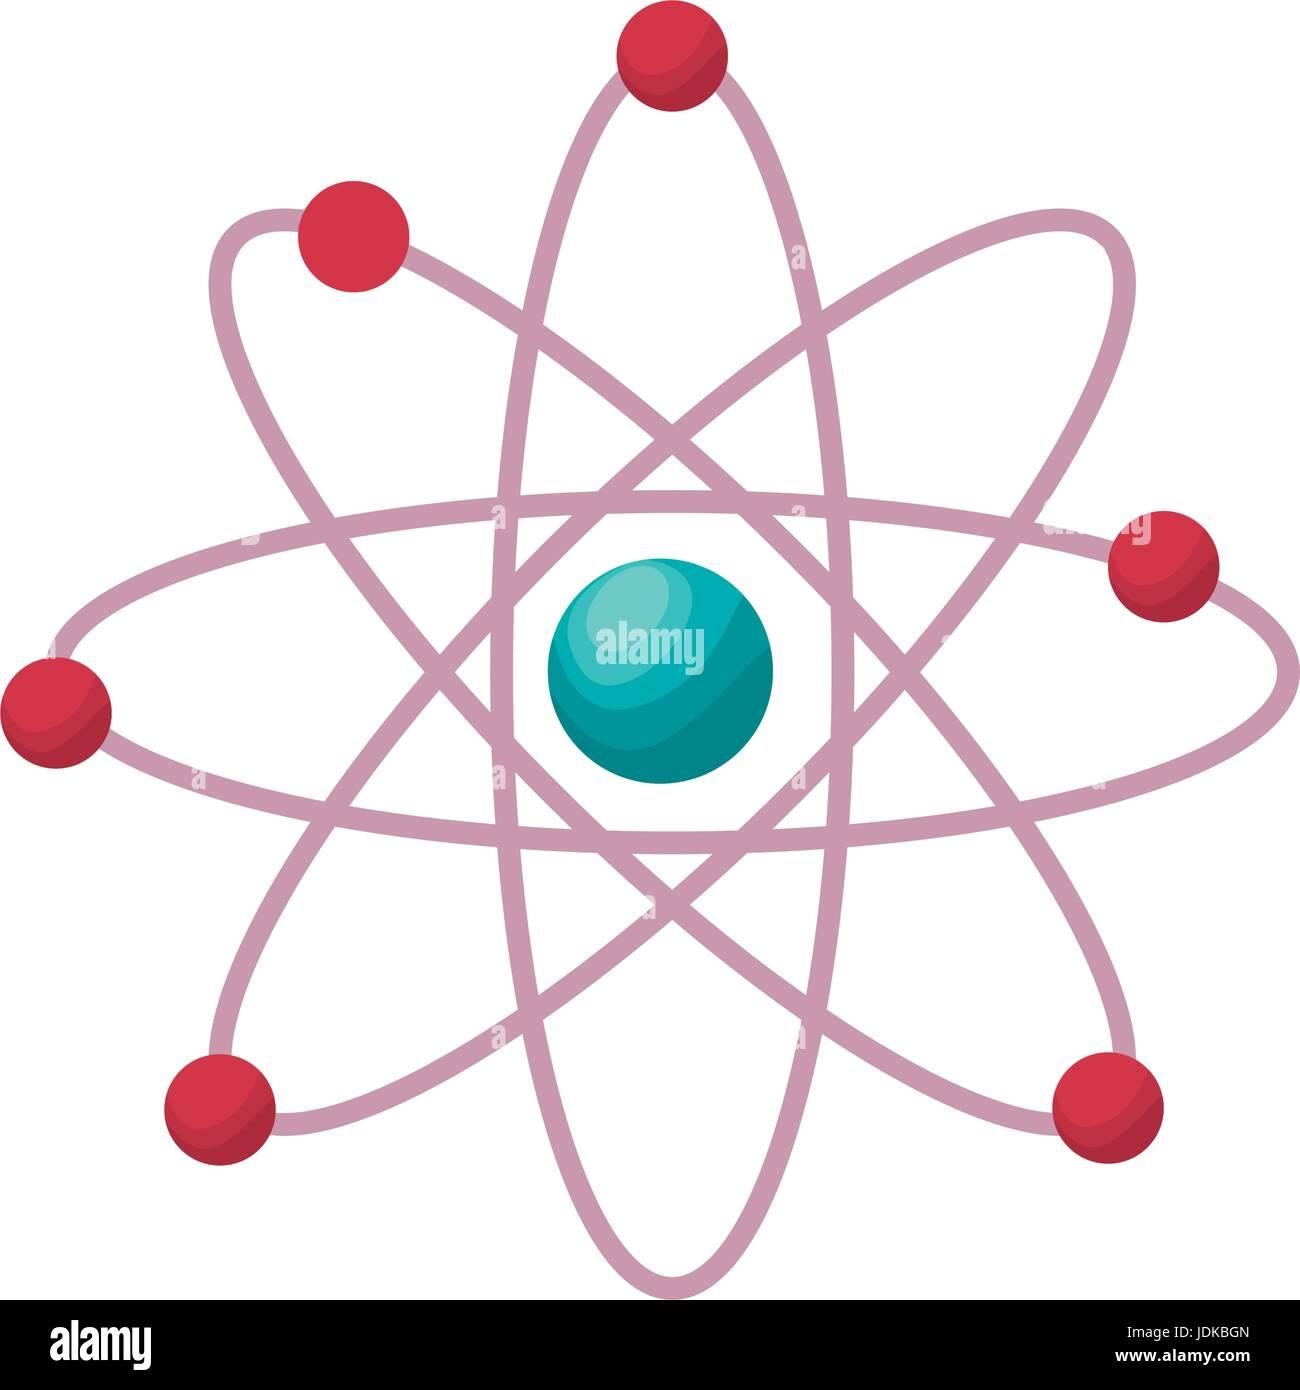 chemical symbol of atom science symbol - Stock Vector